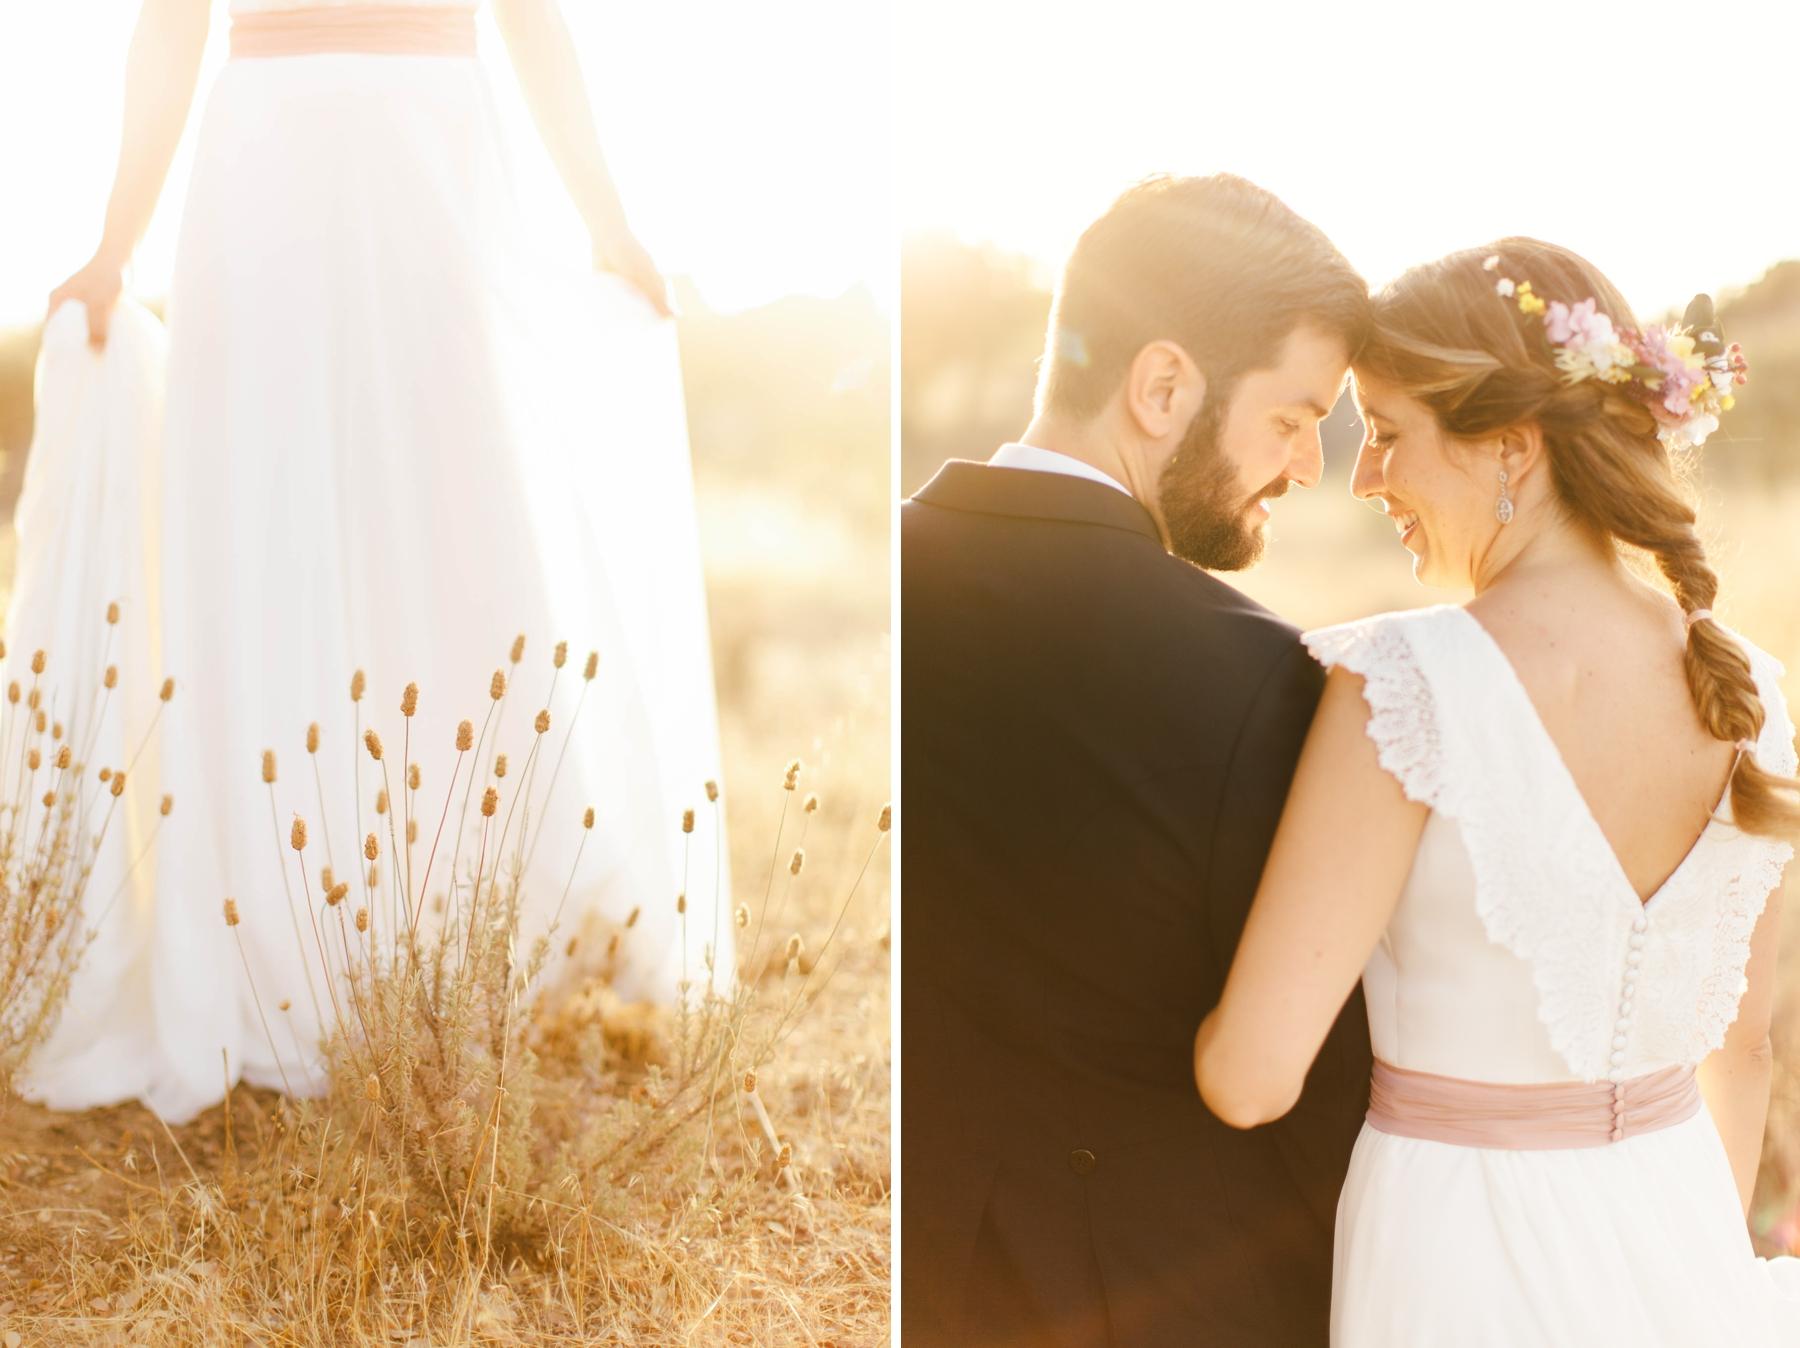 fotografo de bodas Jairo Crena-172